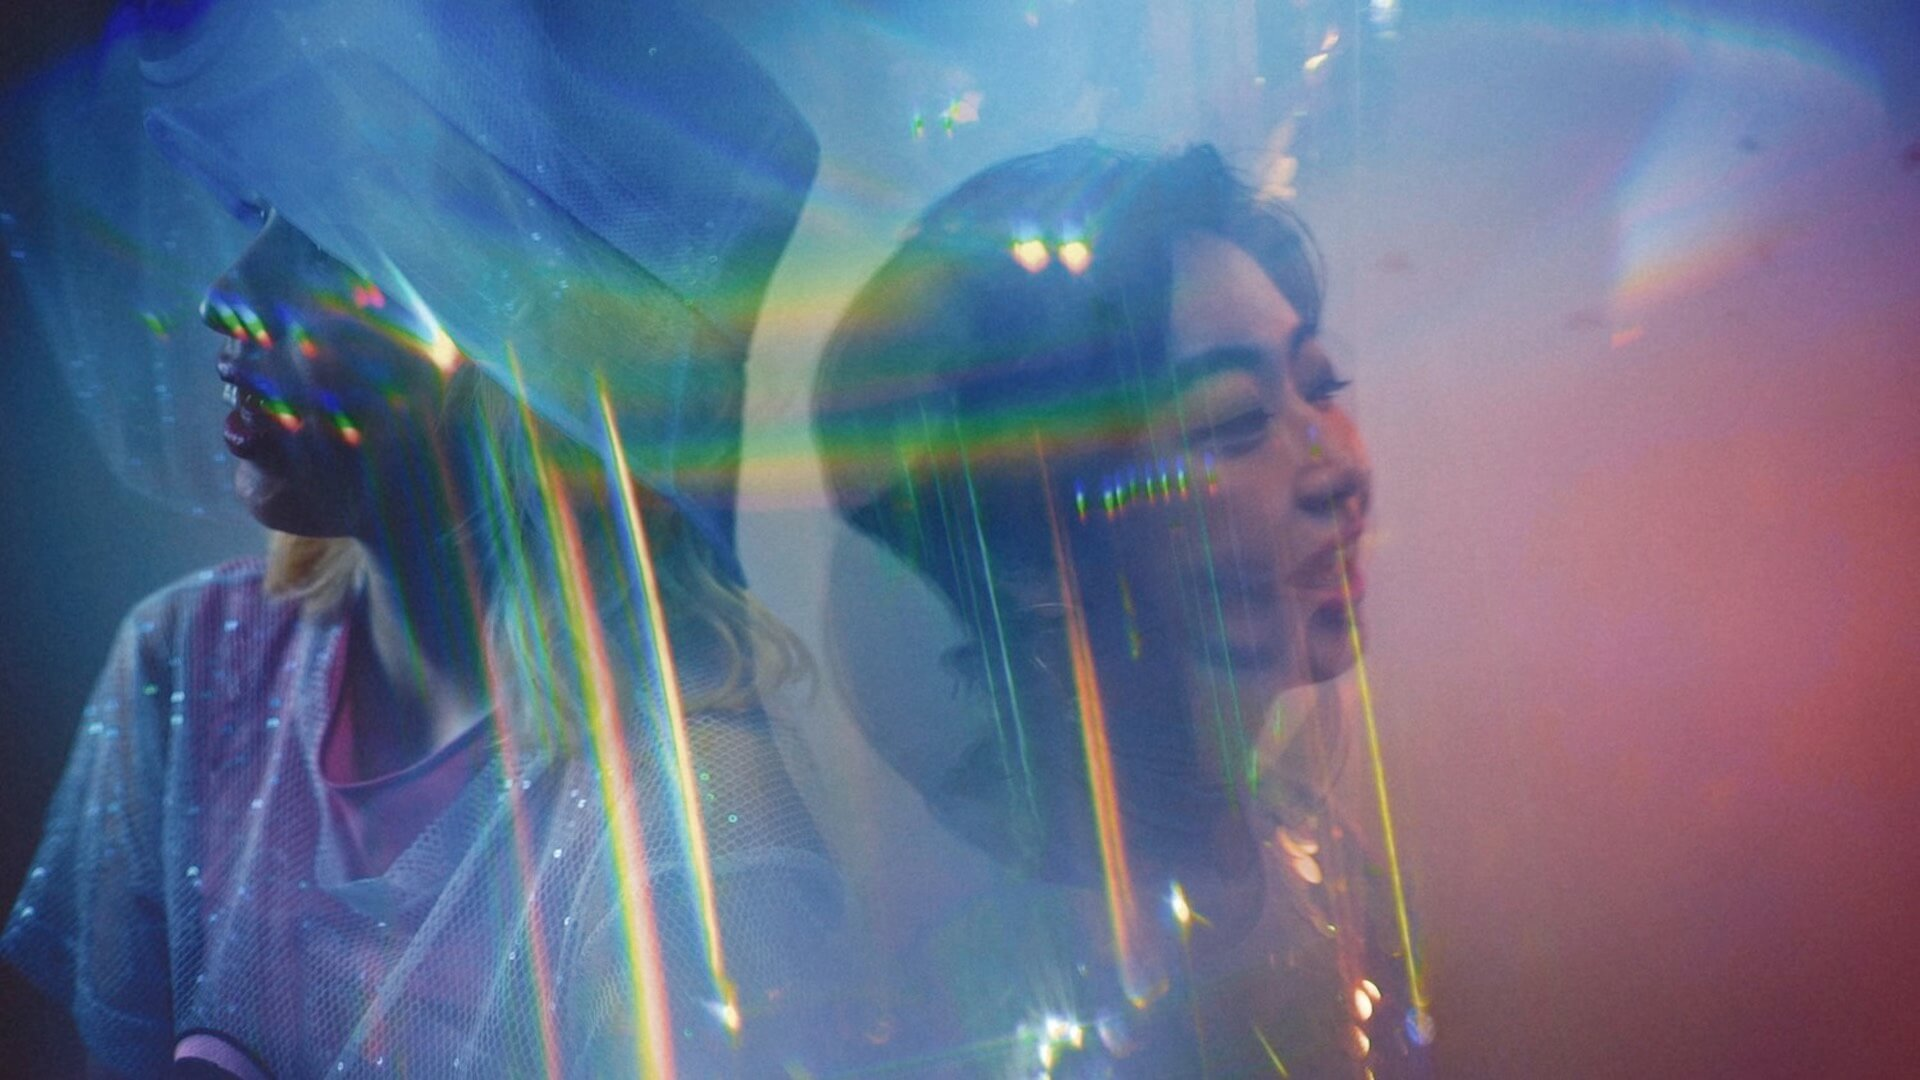 "chelmicoがニューアルバム『maze』発売に先駆け""Disco""をリリース&MV公開!アルバムを視聴できる生番組も今夜配信 music200807_chelmico_mv_03"